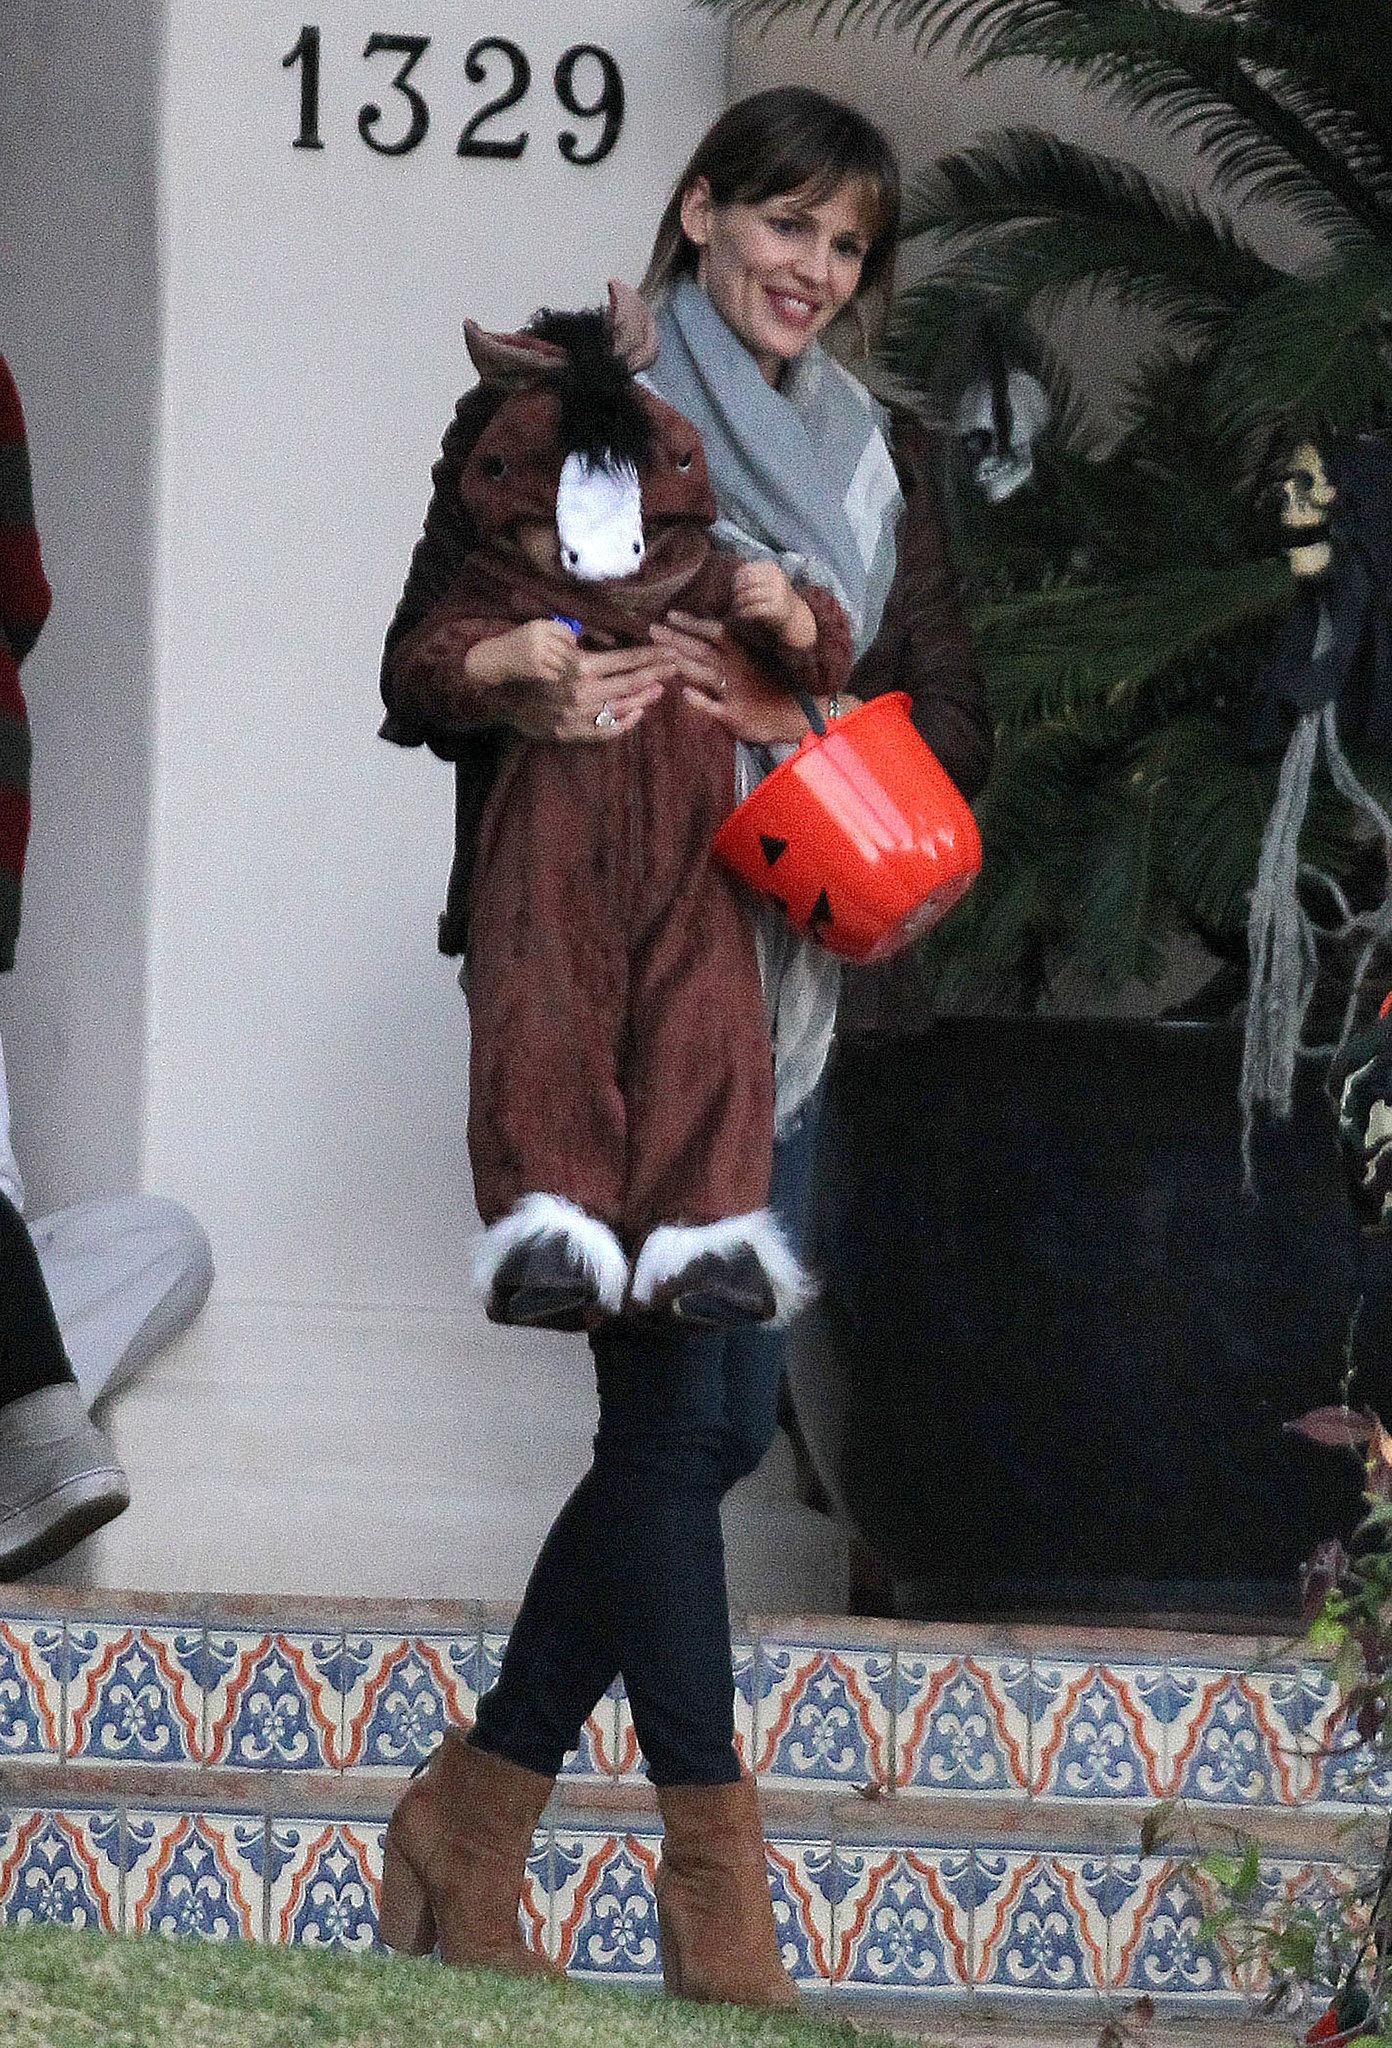 Jennifer Garner carried Samuel Affleck down a few steps.